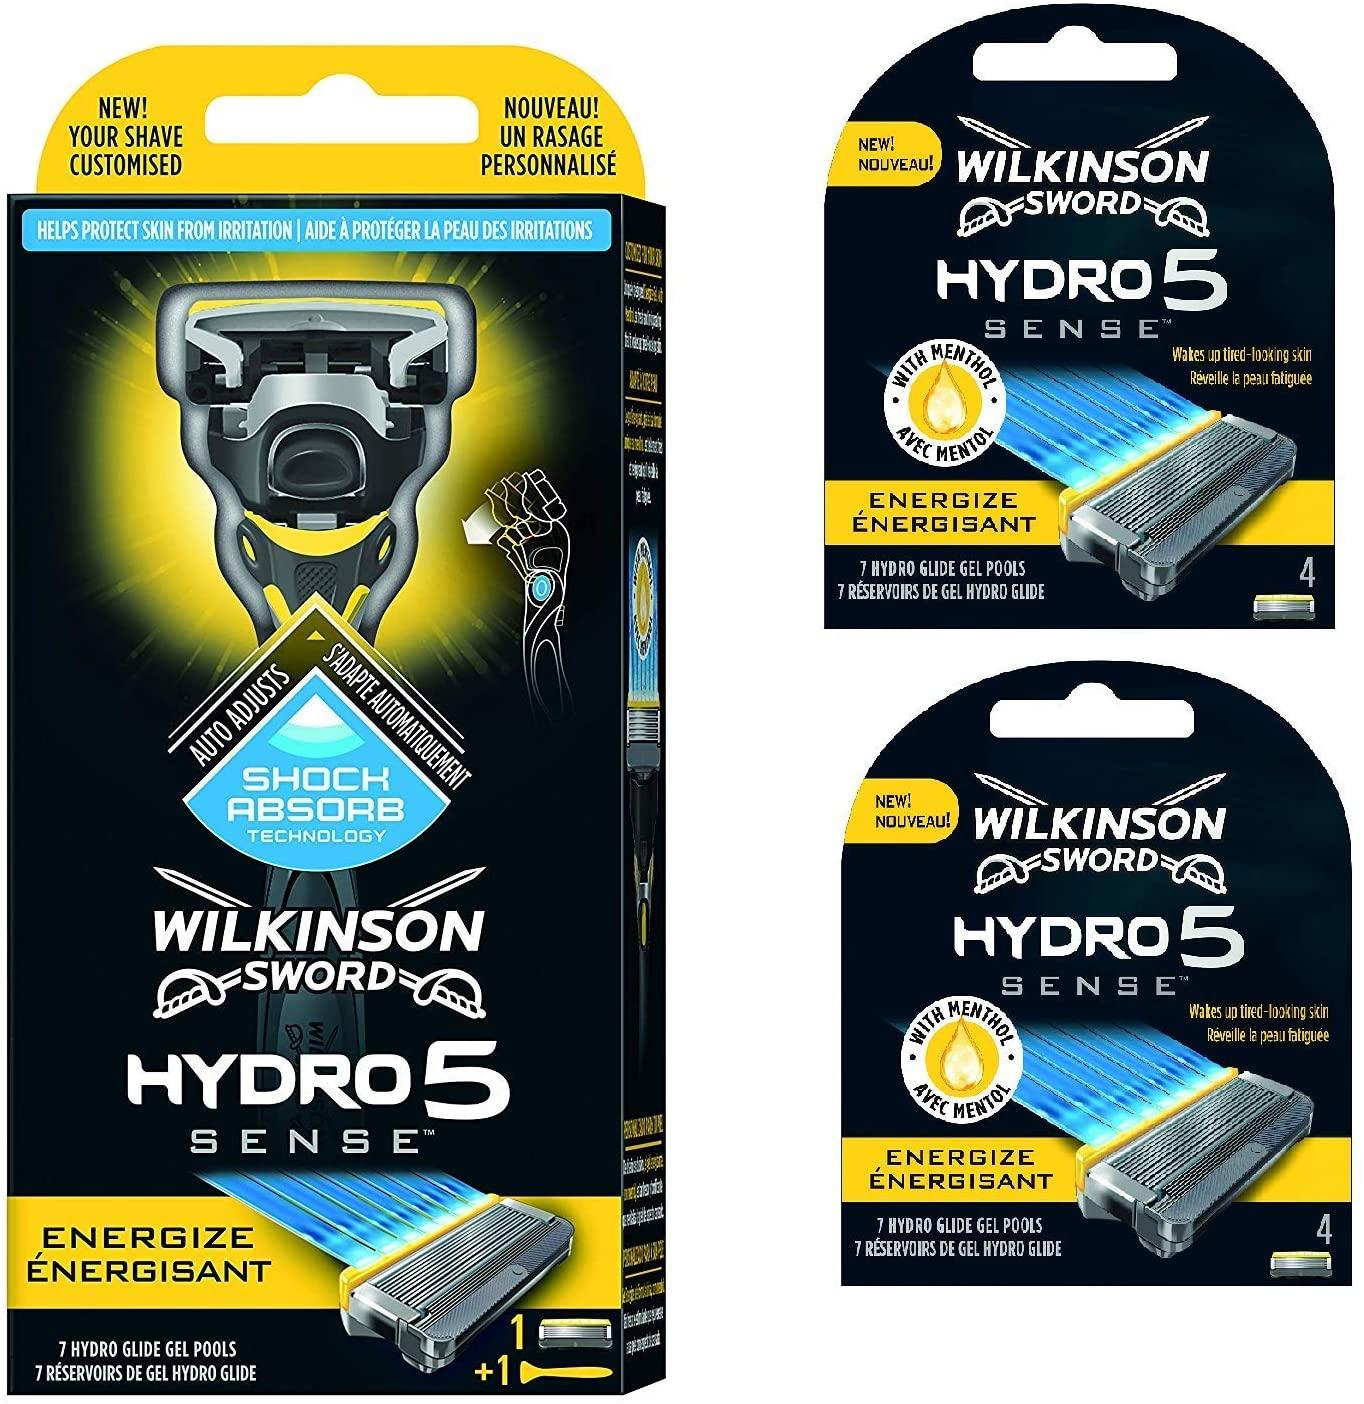 Wilkinson Sword Hydro 5 Sense Pack of Handle and 8 Blades (0.83p / blade) - Costco (Wembley) - £7.48